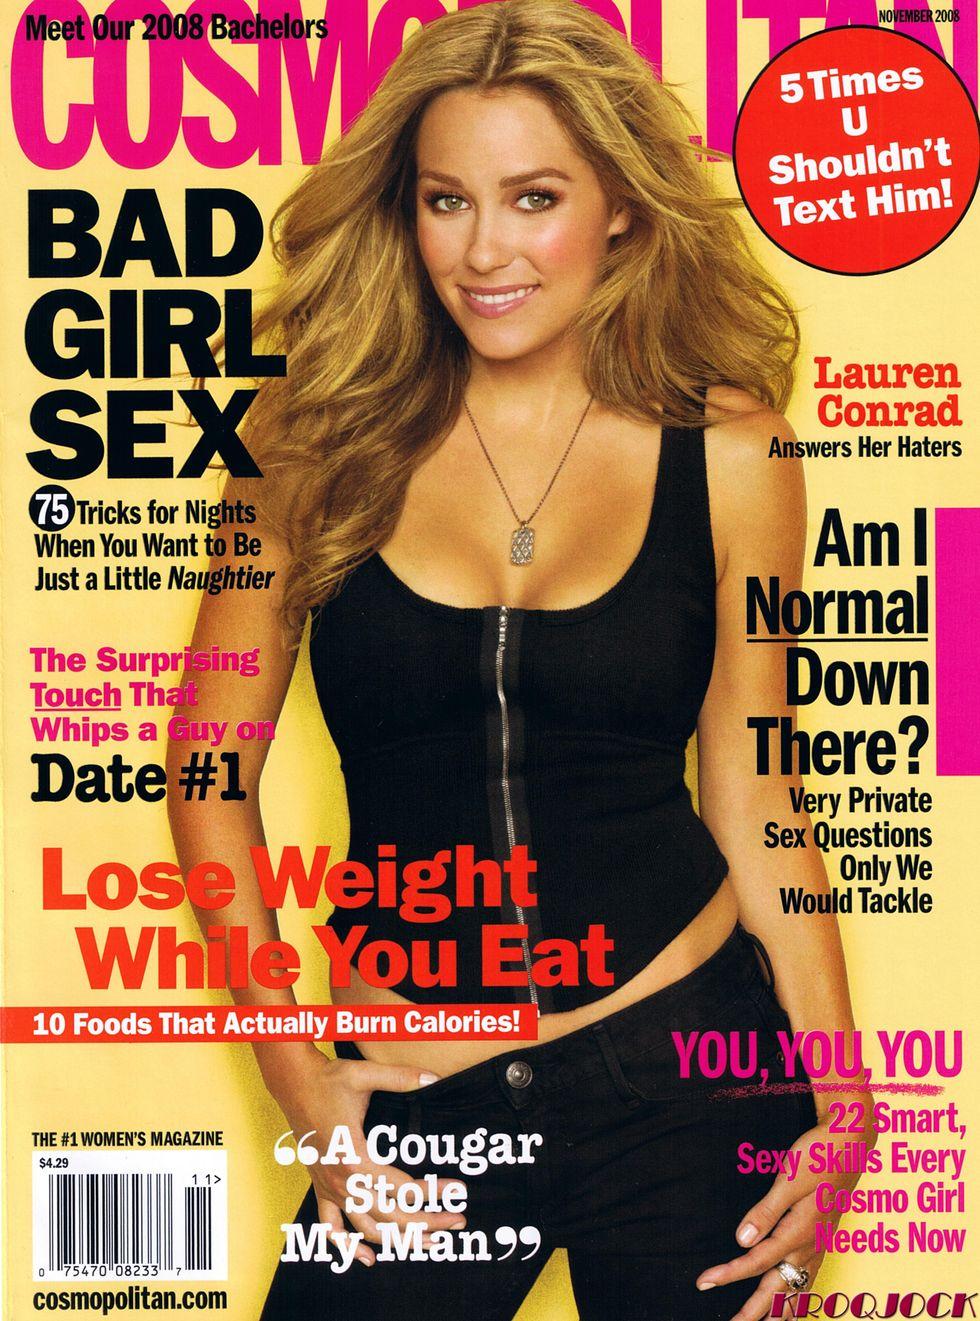 lauren-conrad-cosmopolitan-magazine-november-2008-01